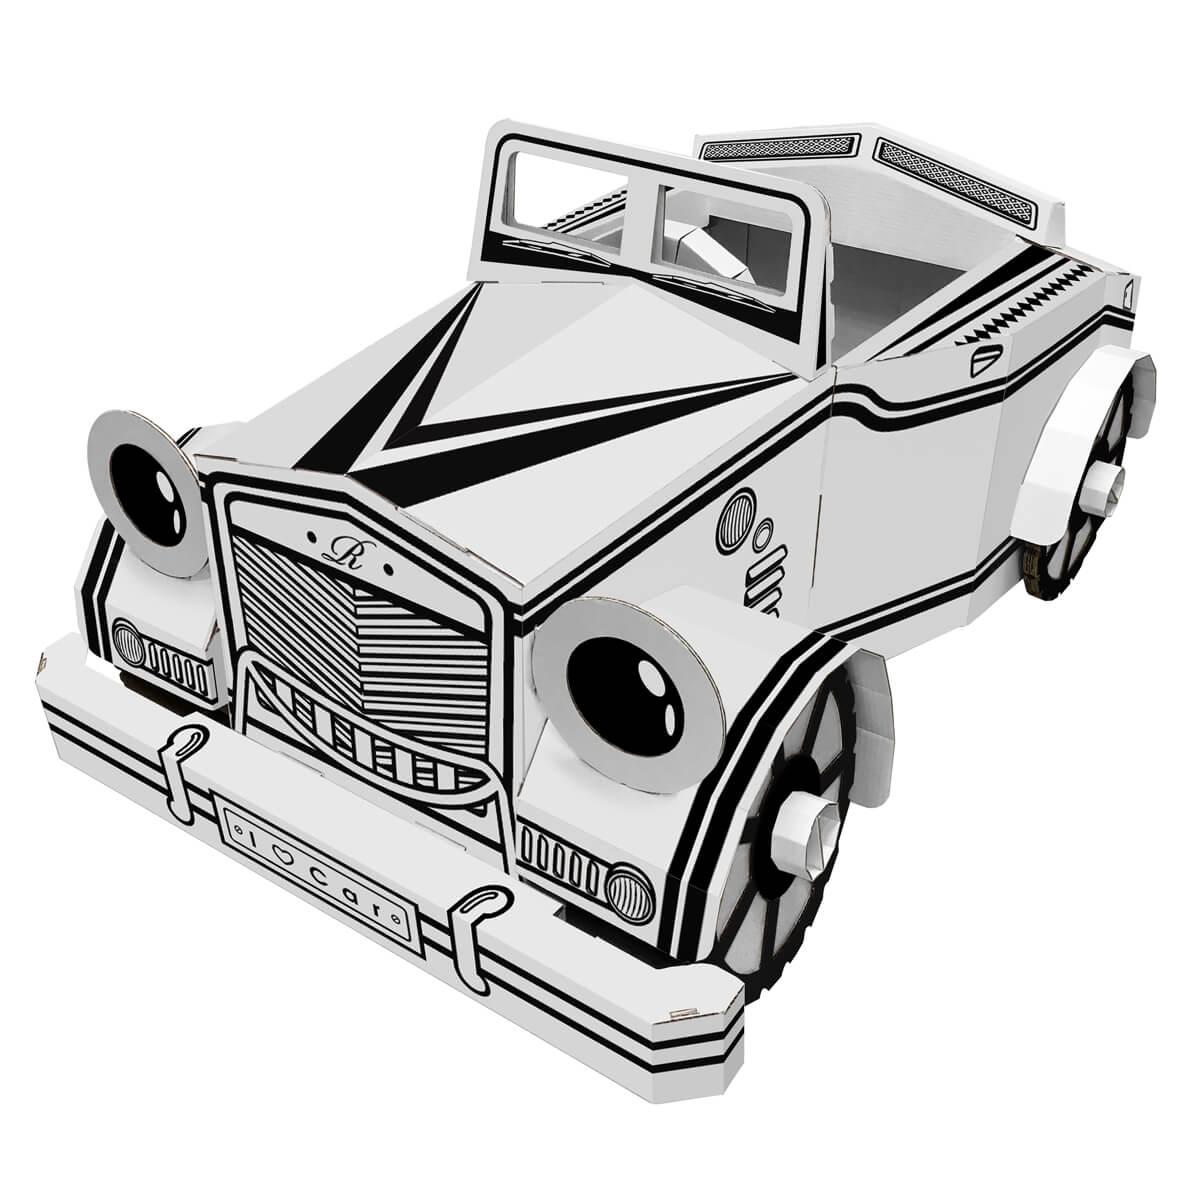 1200x1200 Cardboard Wearable Toy Car